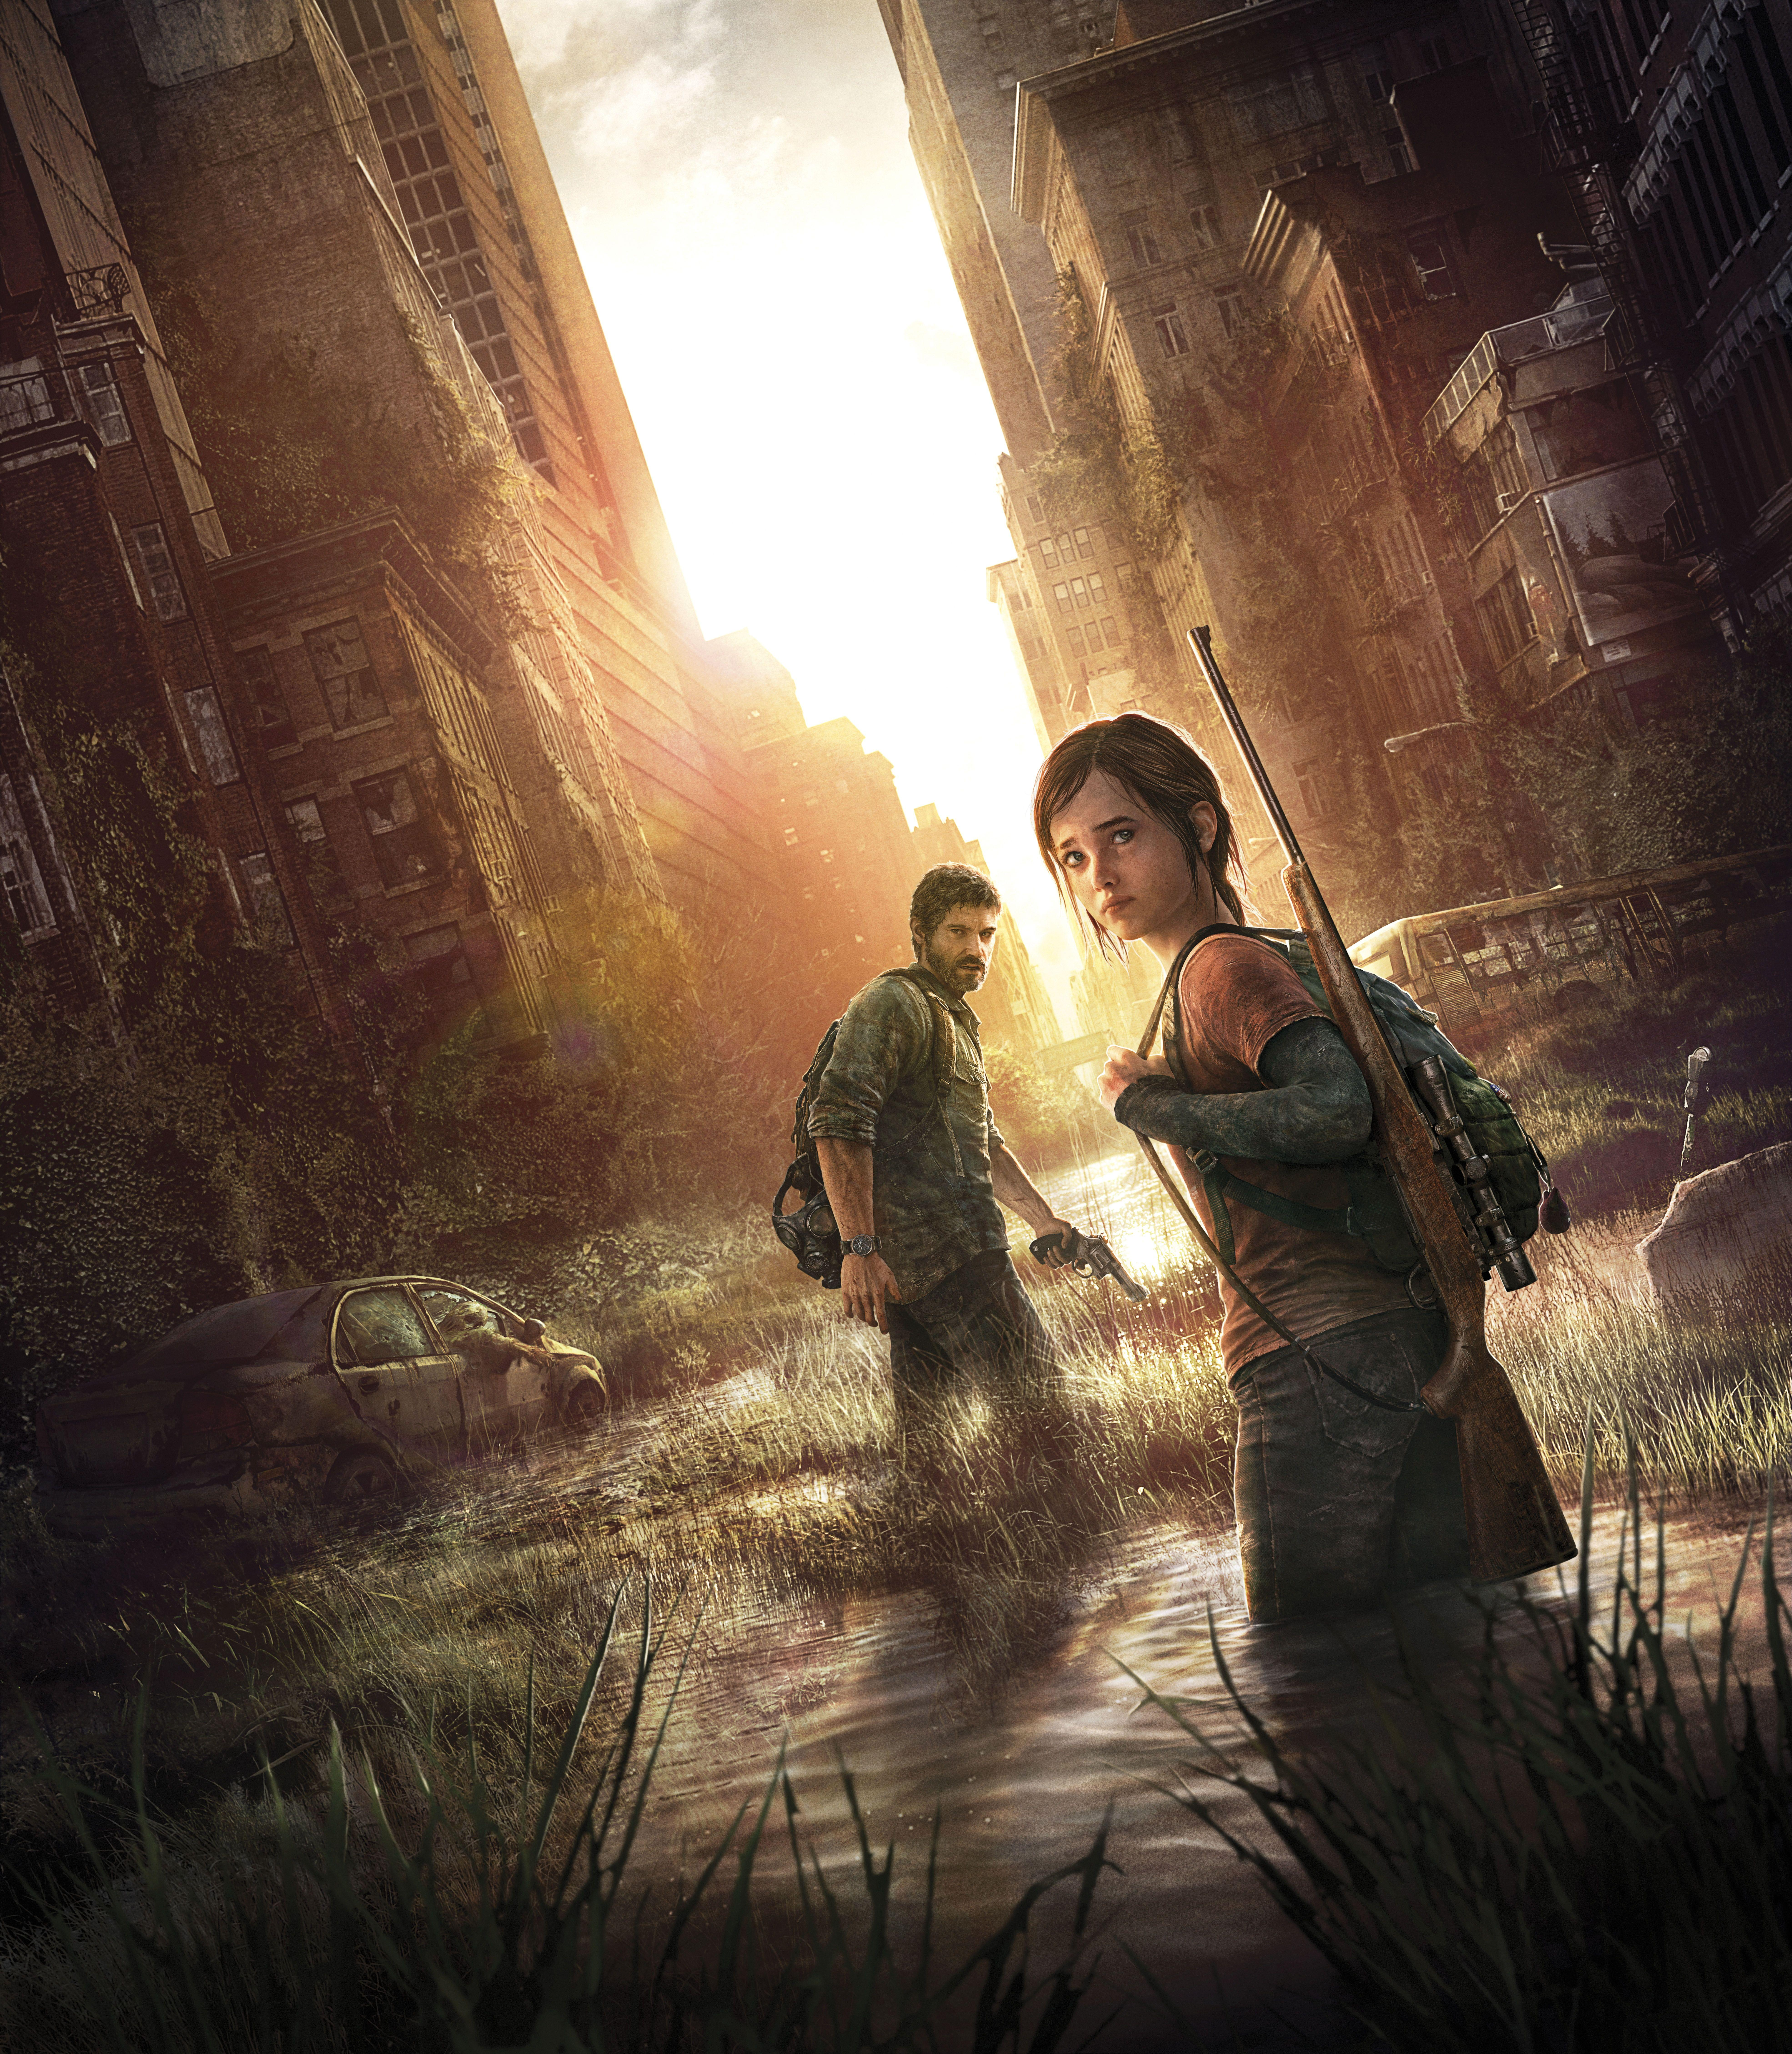 Joel Ellie The Last Of Us 8k 4k 8k Wallpaper Hdwallpaper Desktop In 2020 The Last Of Us The Last Of Us2 The Lest Of Us